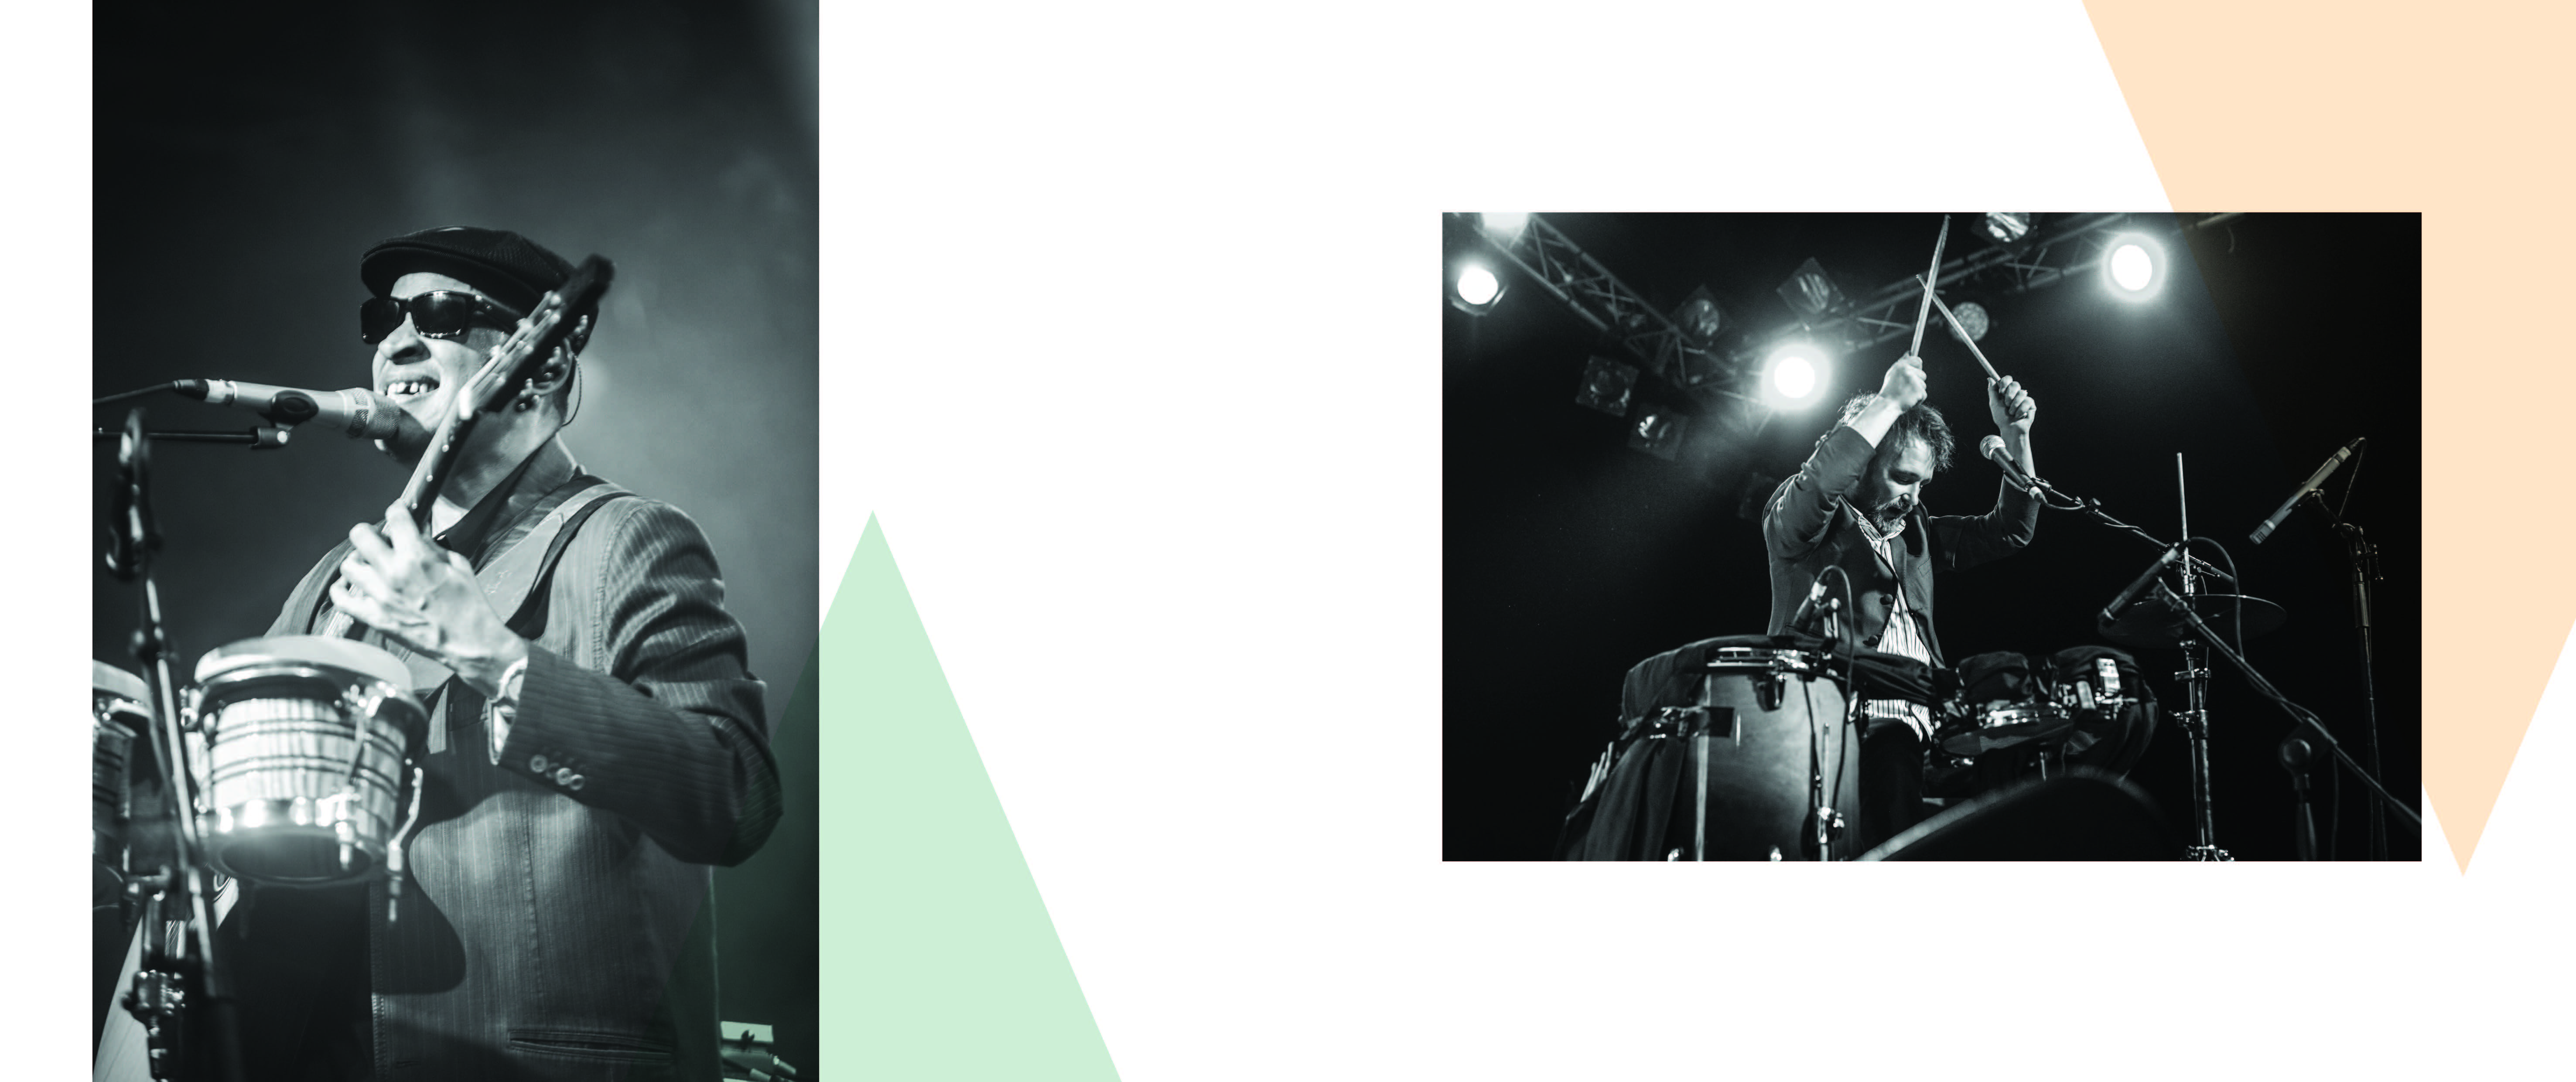 geneve,Appareil photo,Appareil photo,paris,dubai,Creatif,Studio,geneve,strasbourg,studio photo lyon,Cours photo Lyon,agences,geneve,Appareil photo,Appareil photo,evenementielle entreprise,geneve